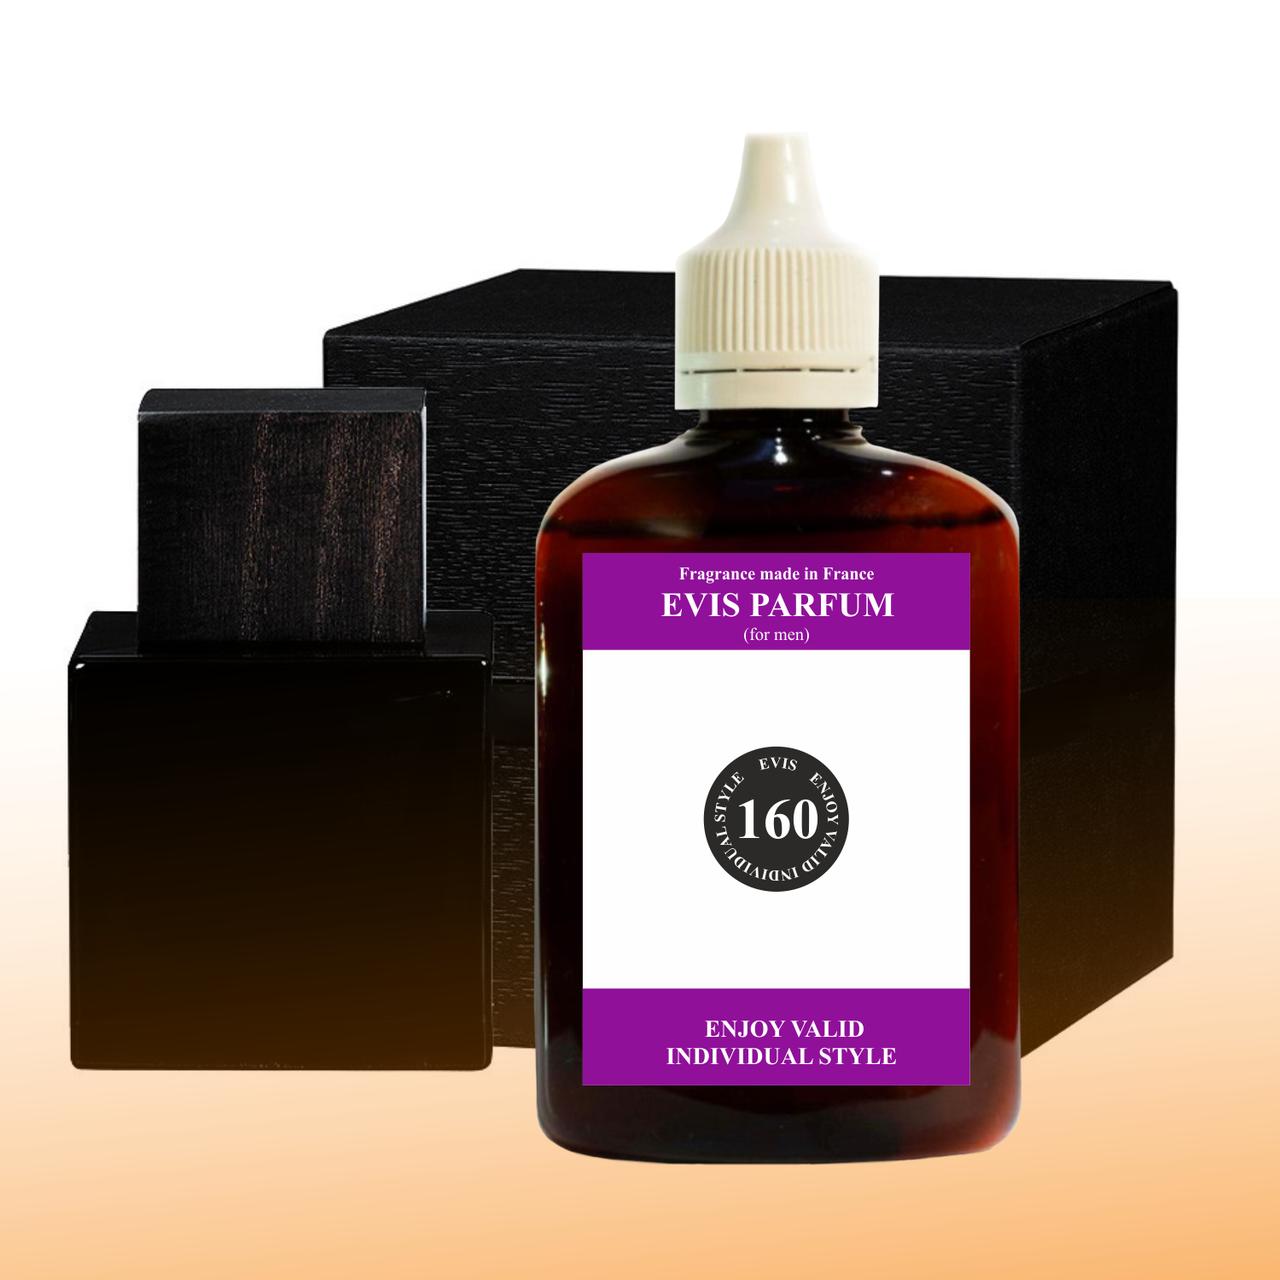 продажа наливной парфюмерии